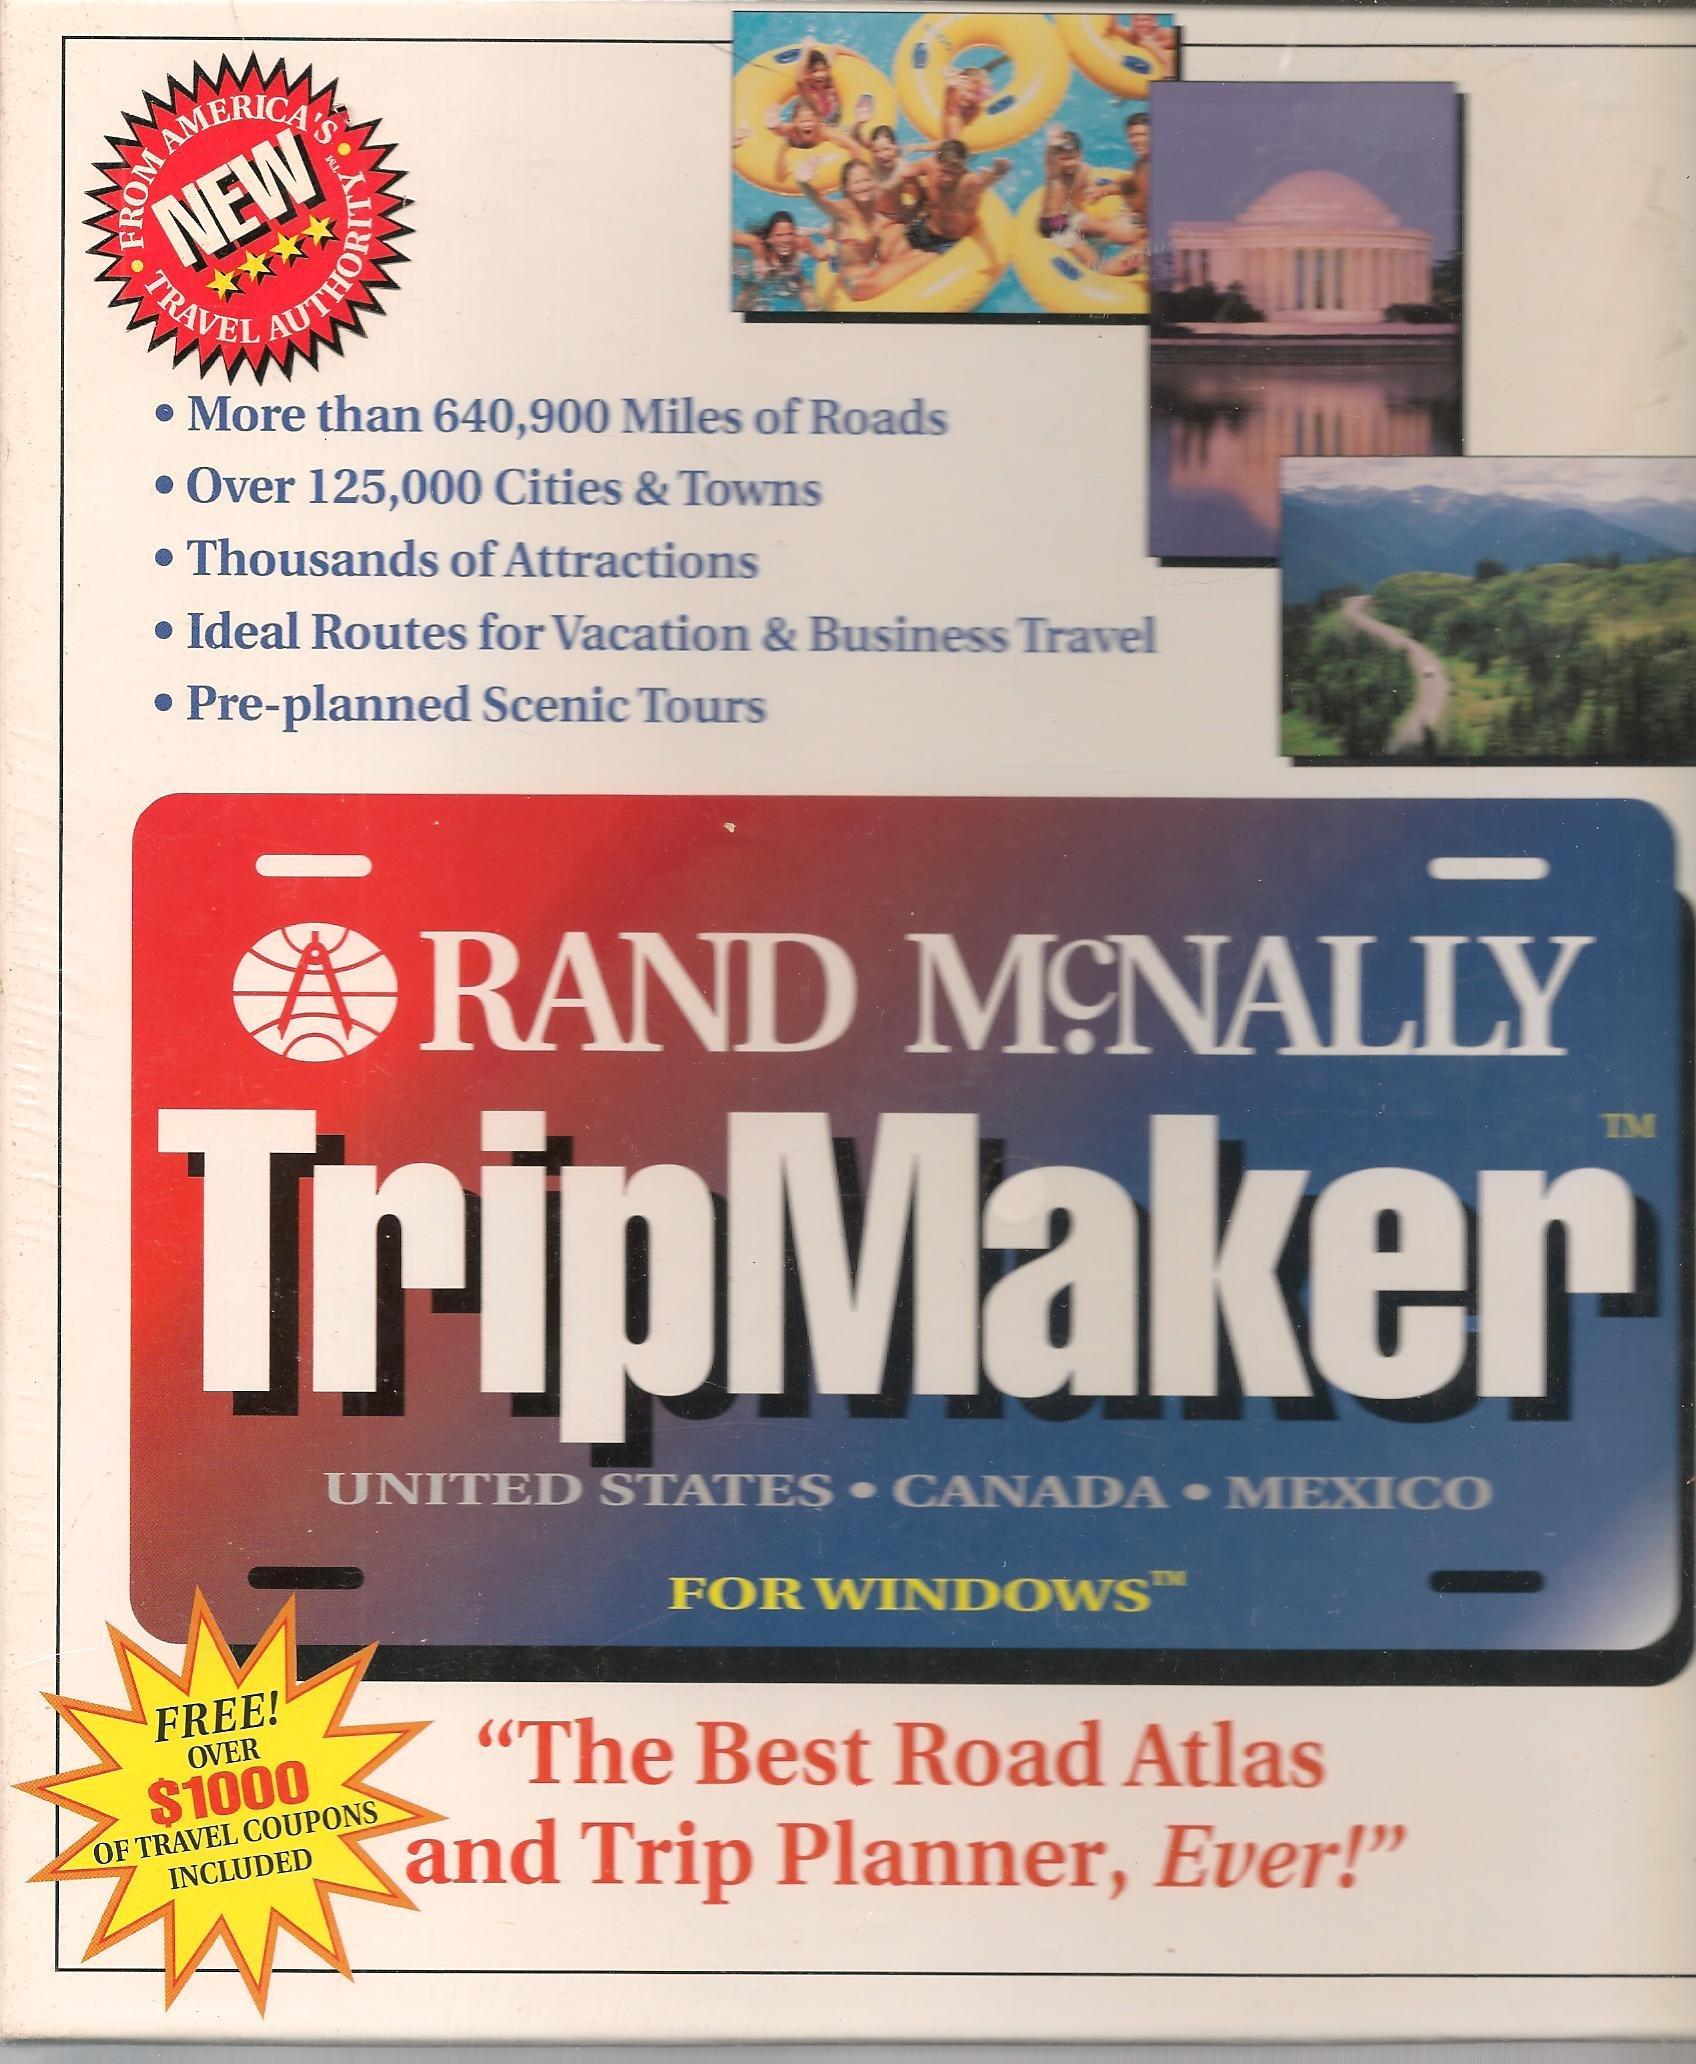 Rand Mcnally Tripmaker >> Rand Mcnally Tripmaker For Windows United States Canada Mexico